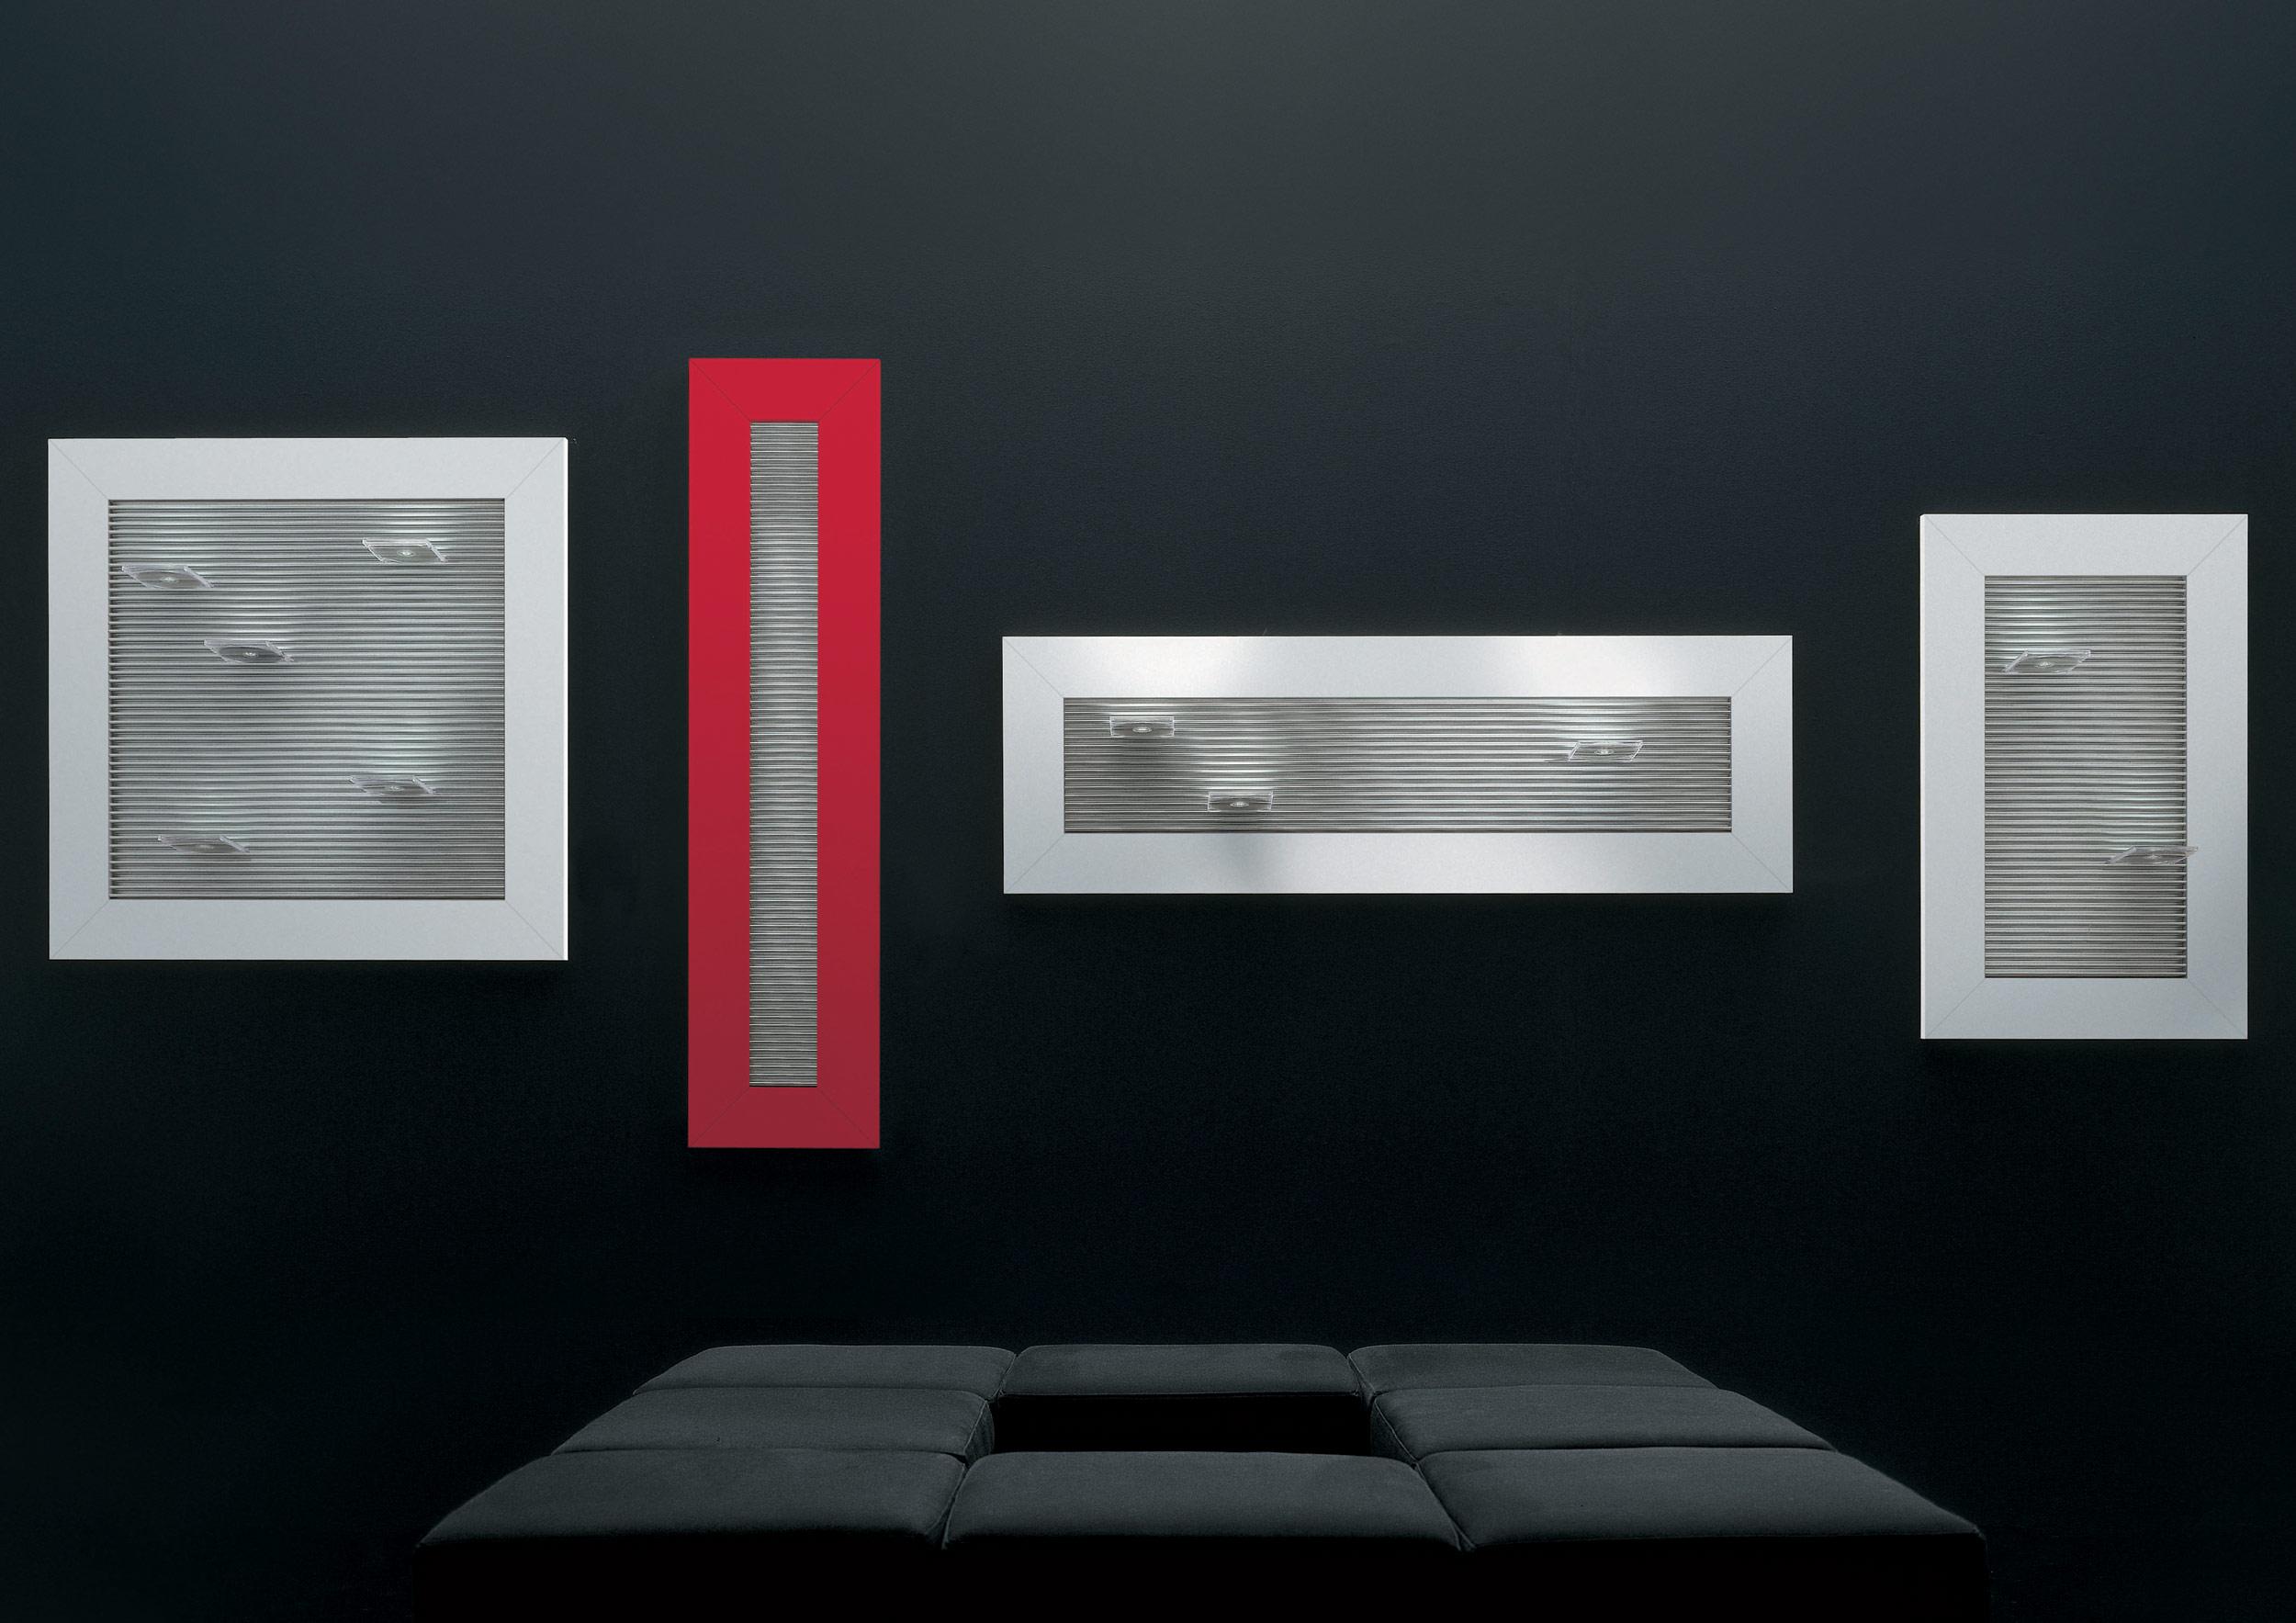 Porta cd XCD – design by Massimo Cavana for Res design.